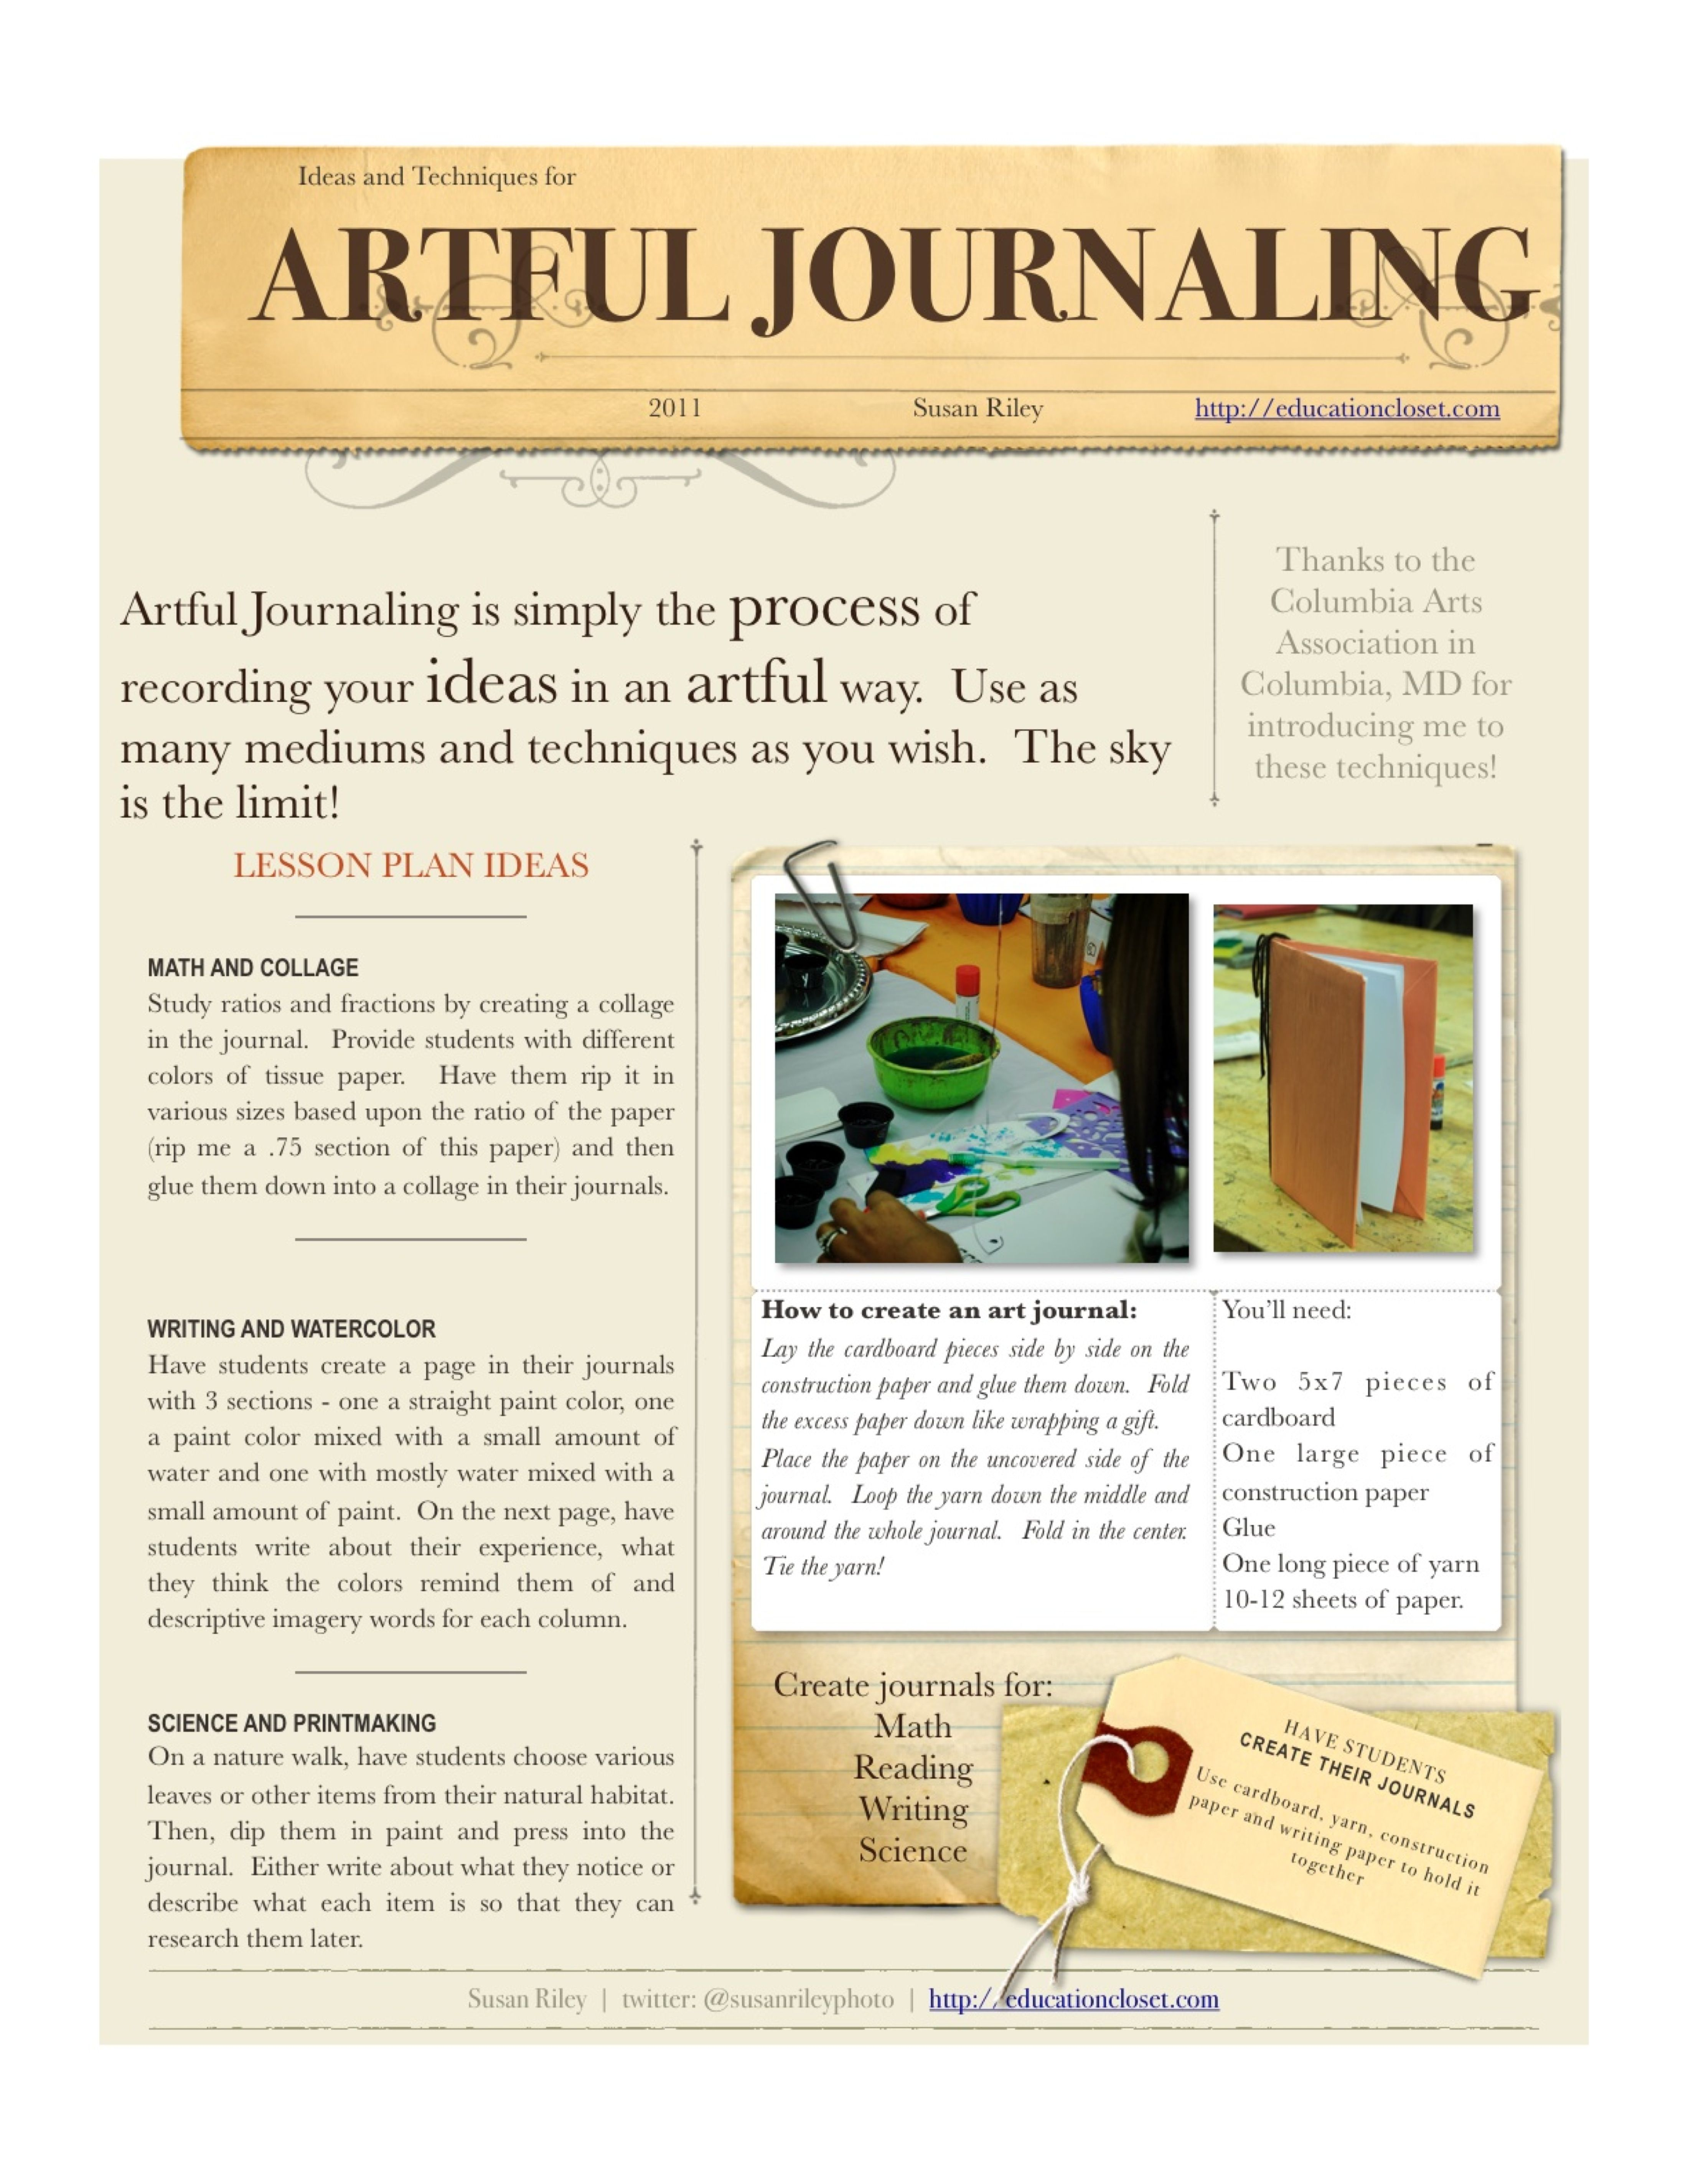 Artful Journaling Technique